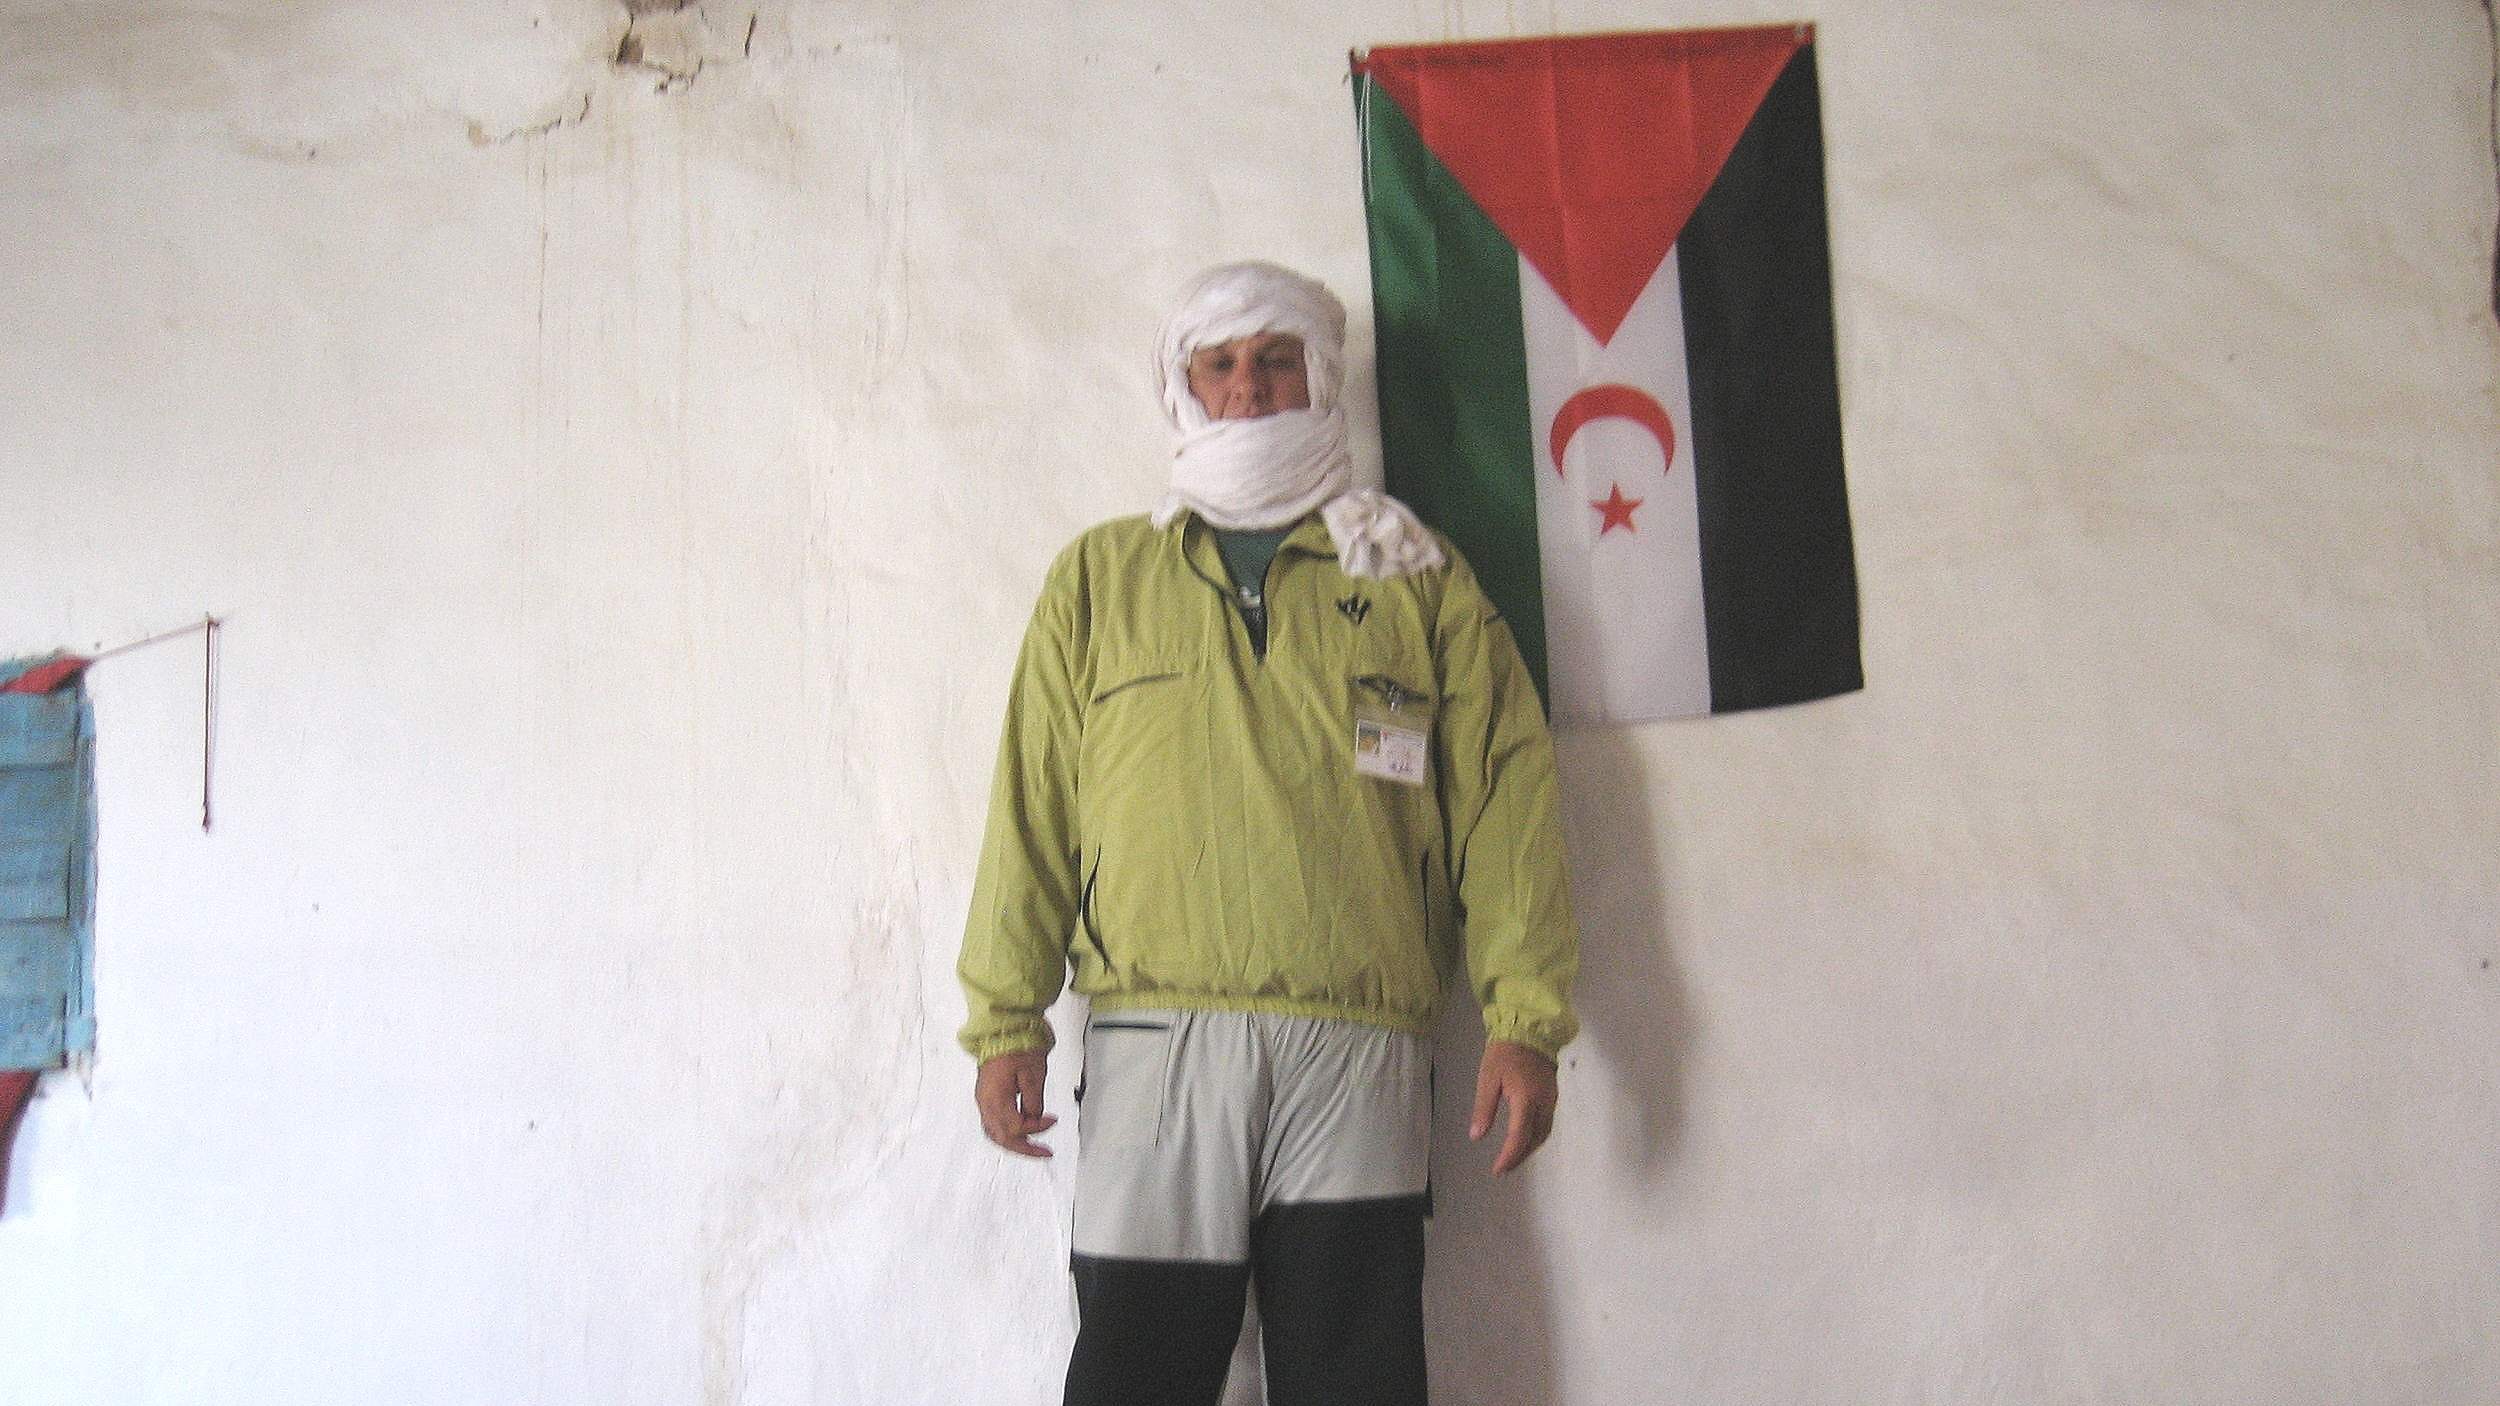 acampamento saharoui onde fiquei detido em Bir Lehlou, Saara Ocidental